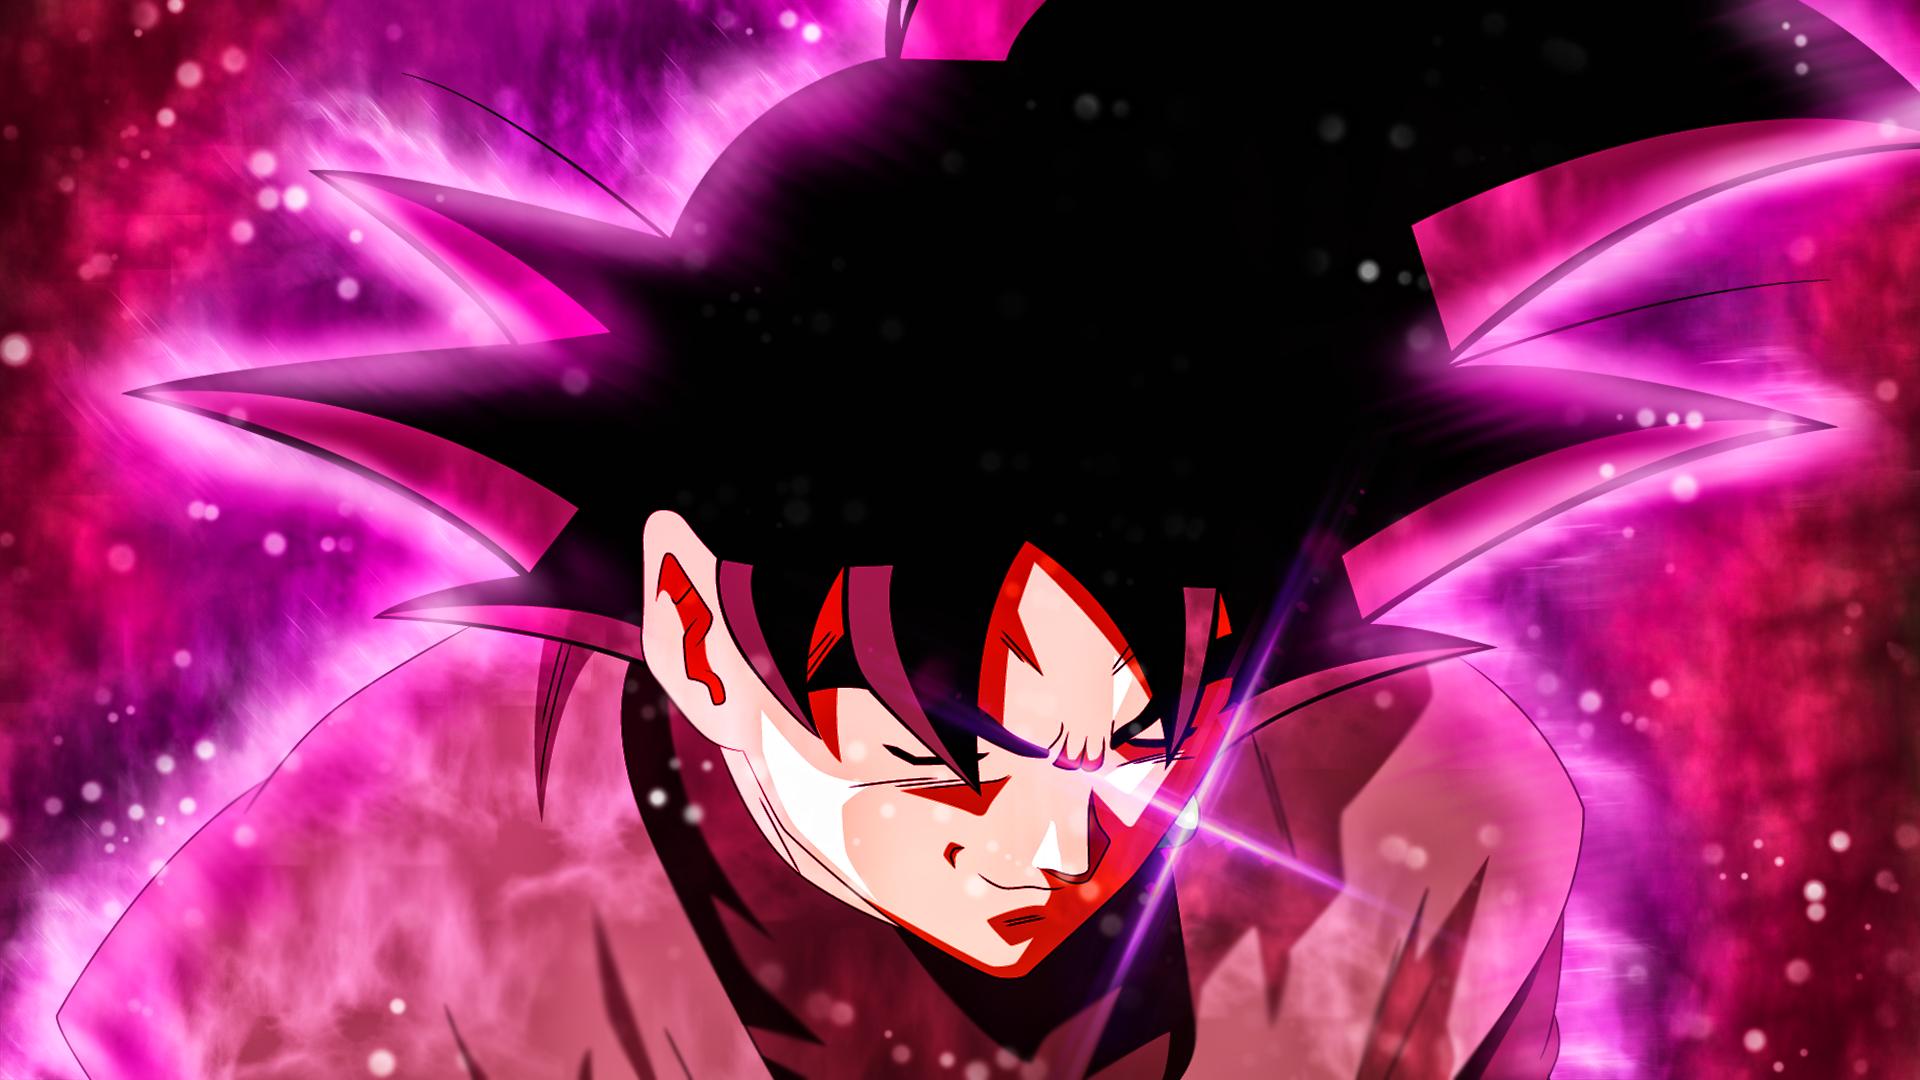 Free Download Black Goku By Rmehedi 1920x1080 For Your Desktop